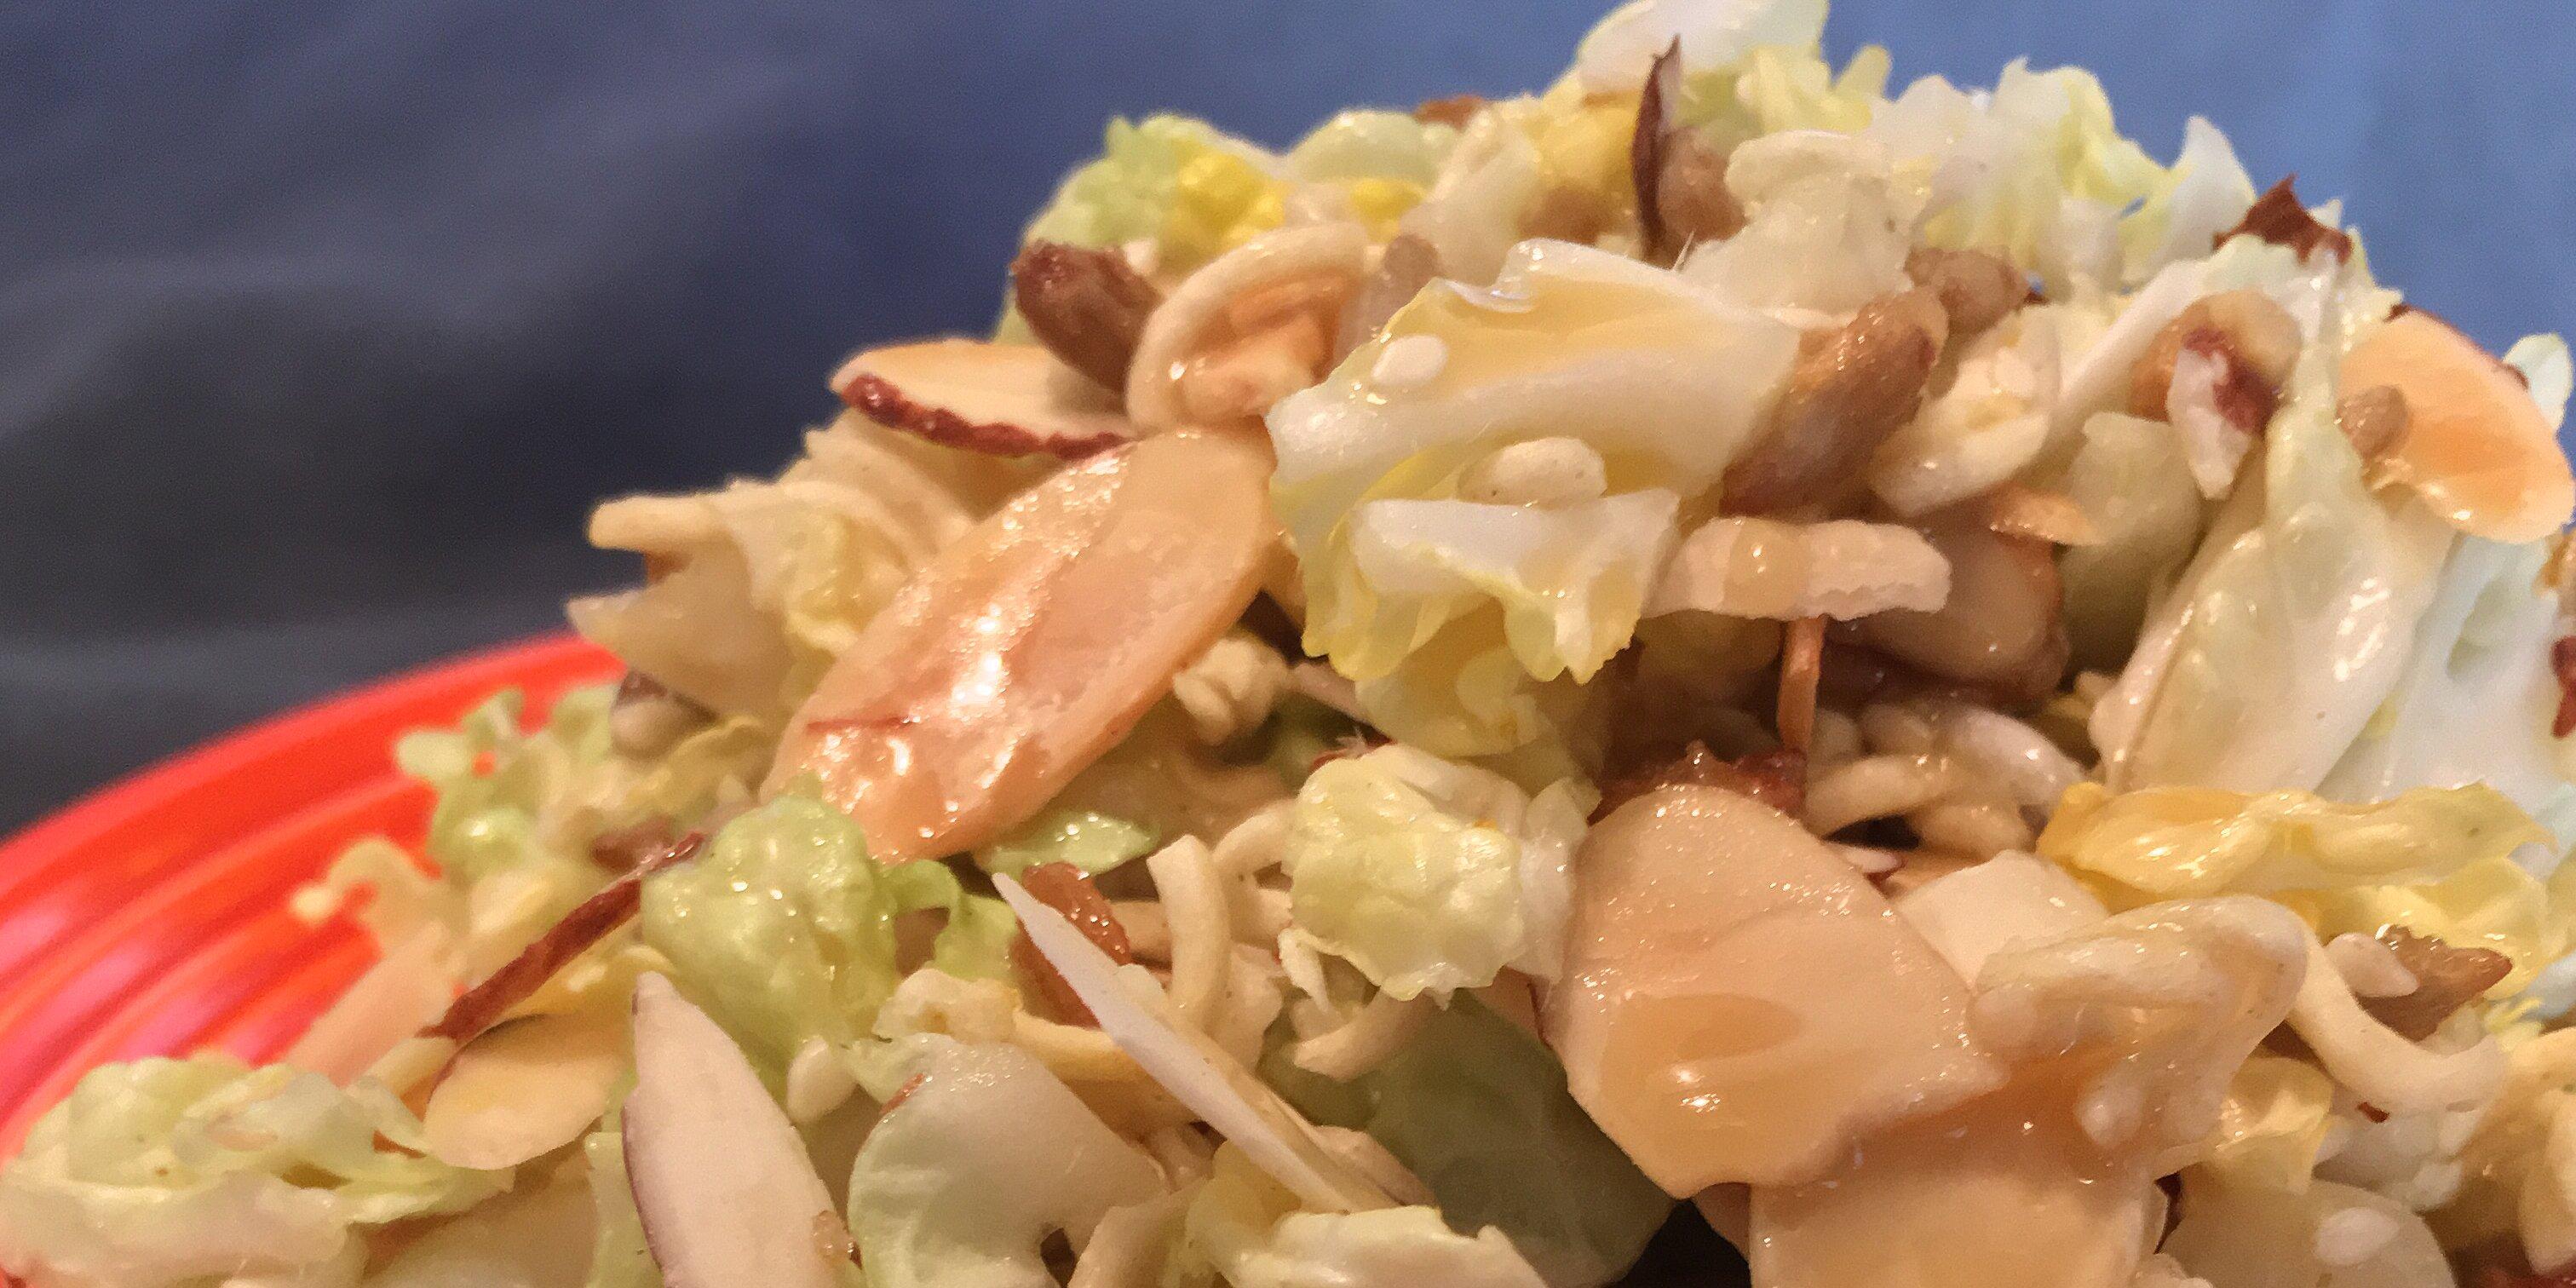 sallys napa cabbage salad recipe